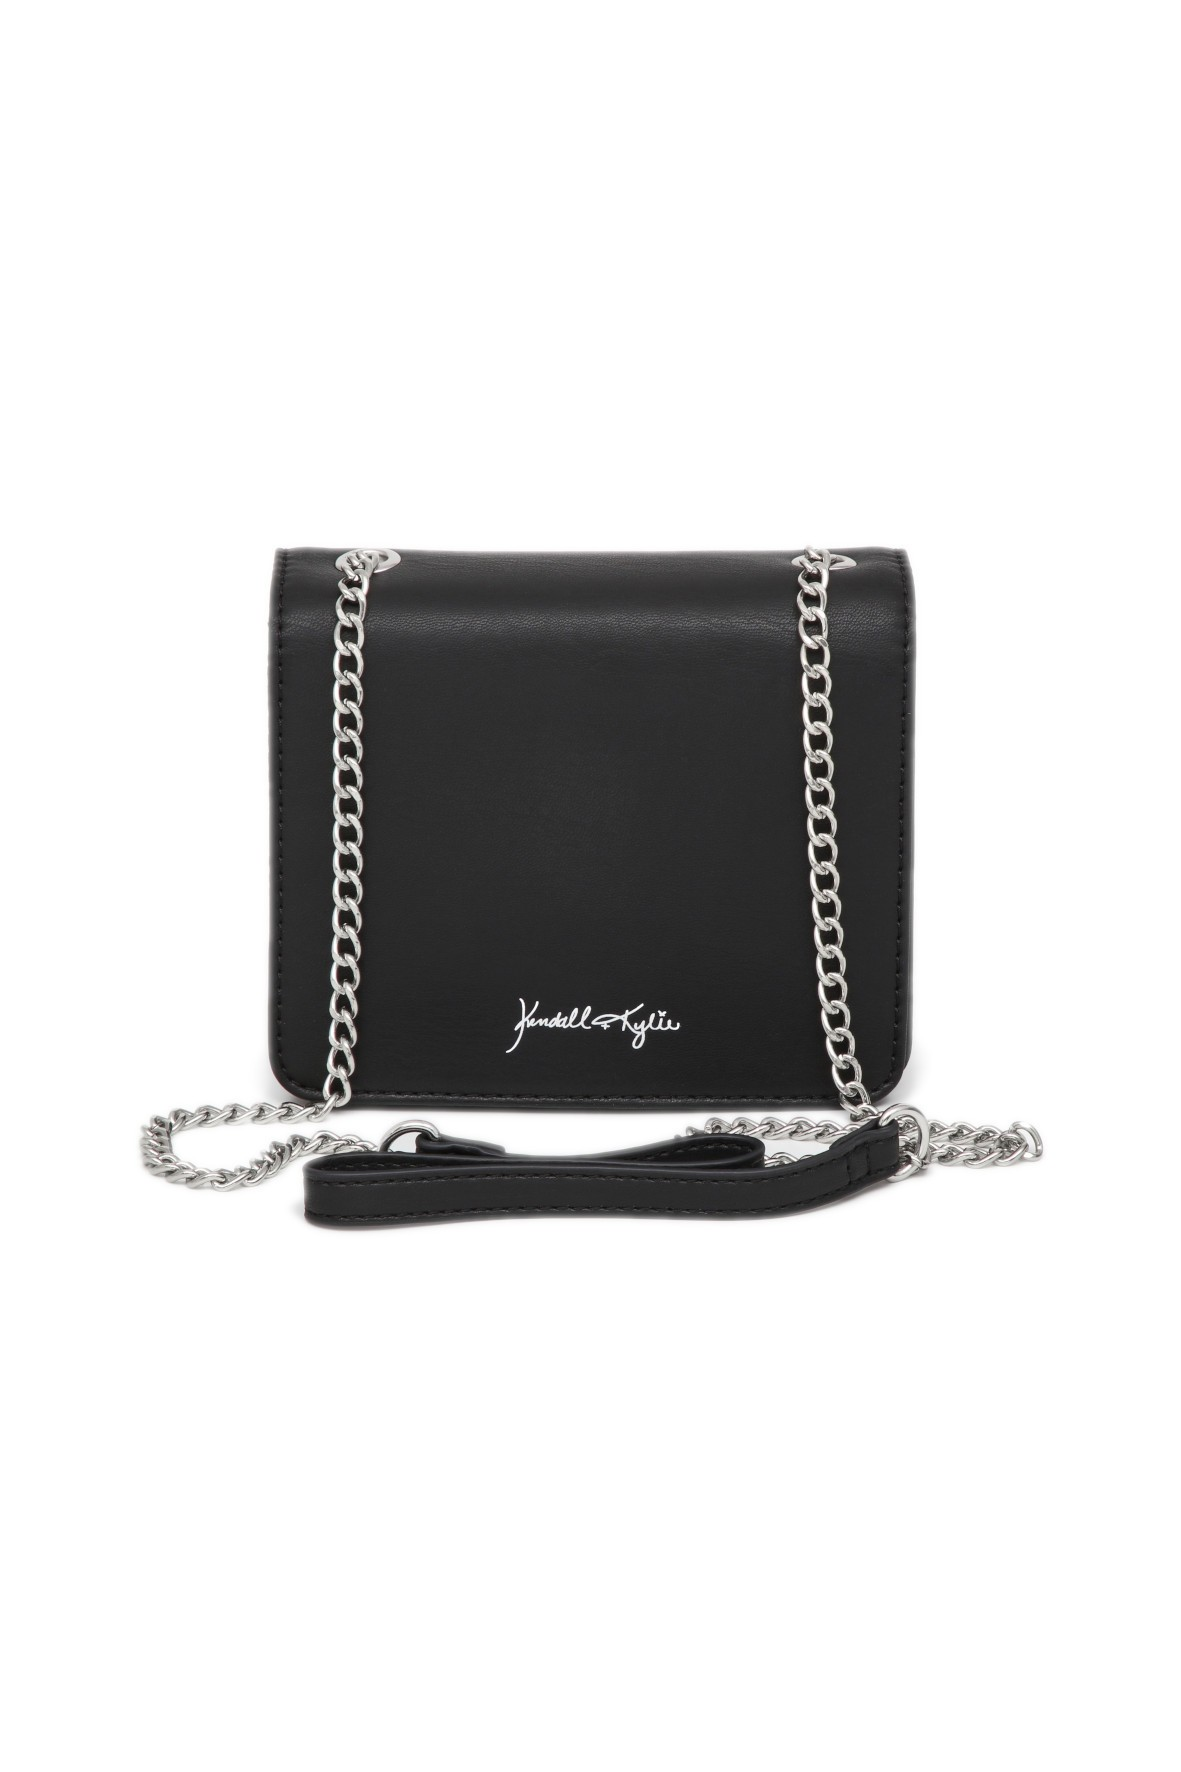 Czarna, prostokątna torebka na srebrnym łańcuszku